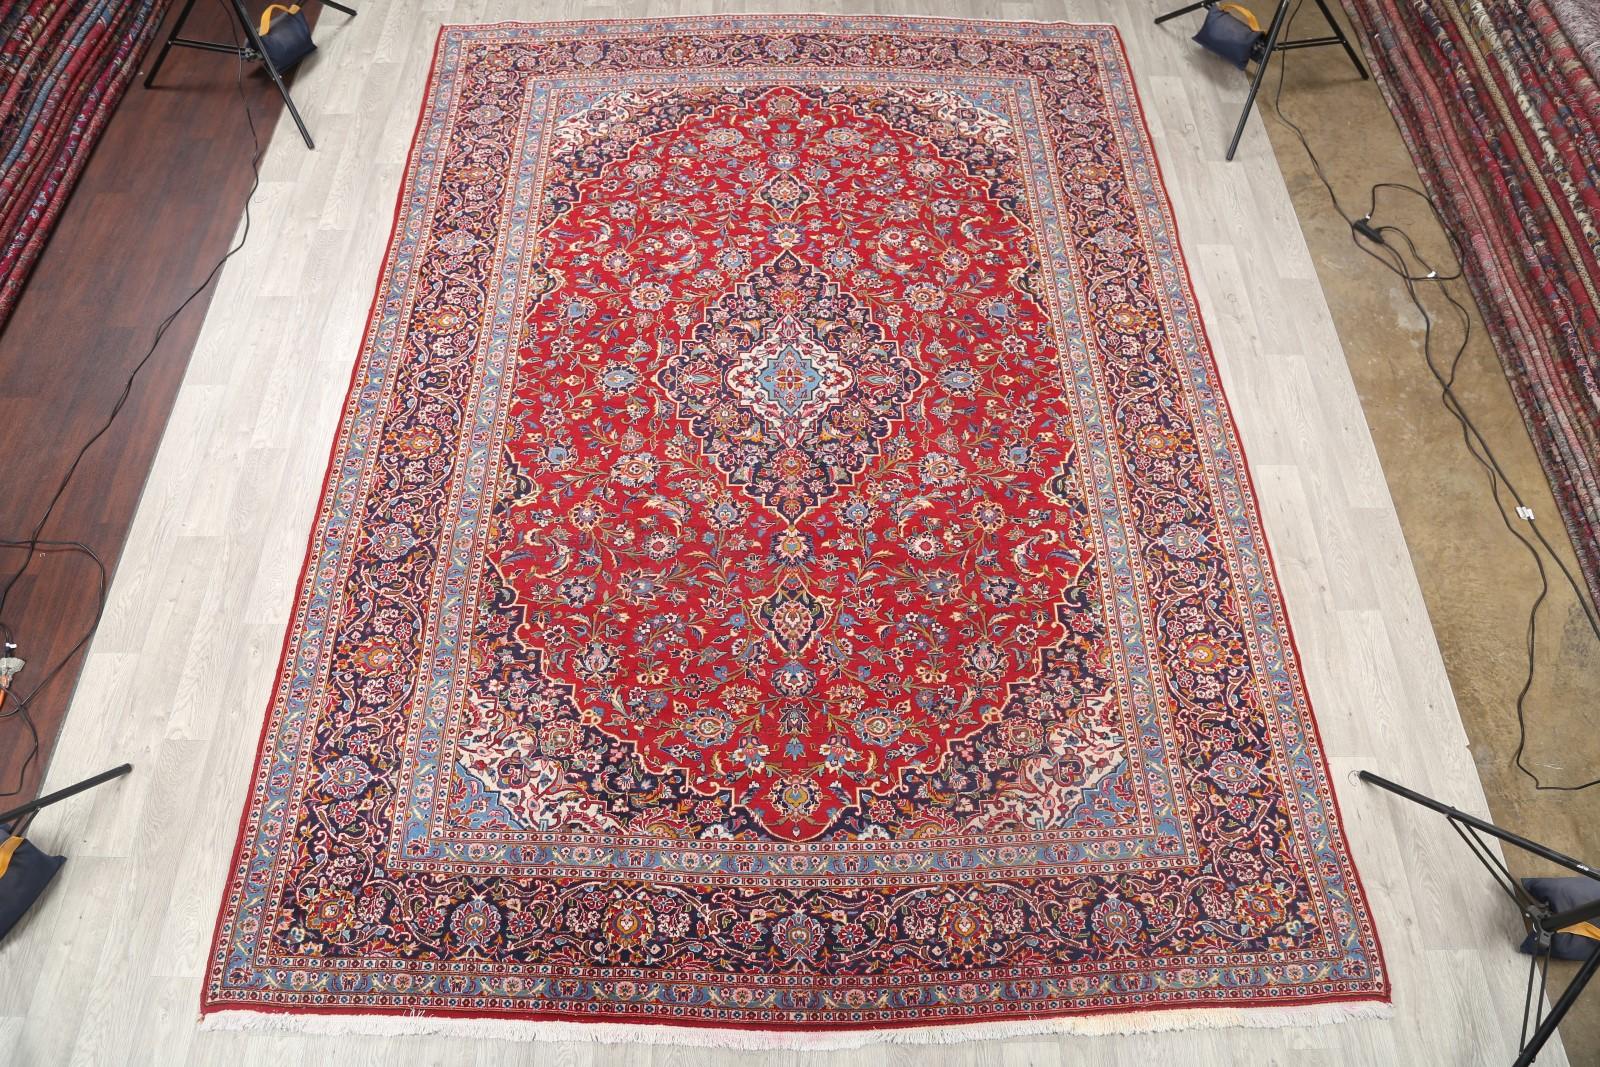 clearance 10x13 kashan persian area rug wool oriental carpet 13 39 4 x 9 39 8 ebay. Black Bedroom Furniture Sets. Home Design Ideas